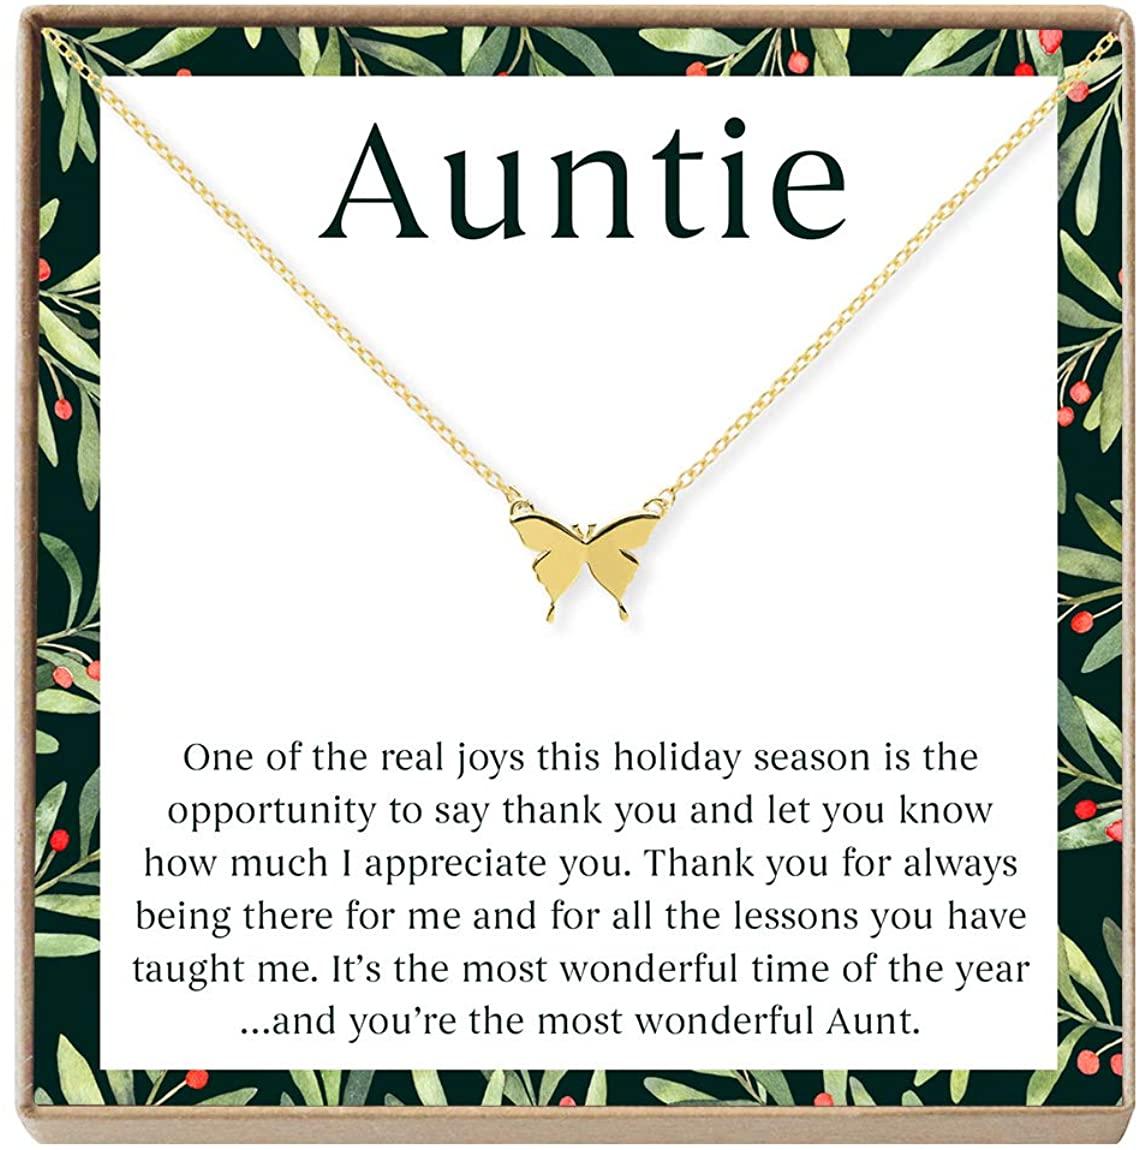 Aunt Christmas - Heartfelt Card & Jewelry Gift Set